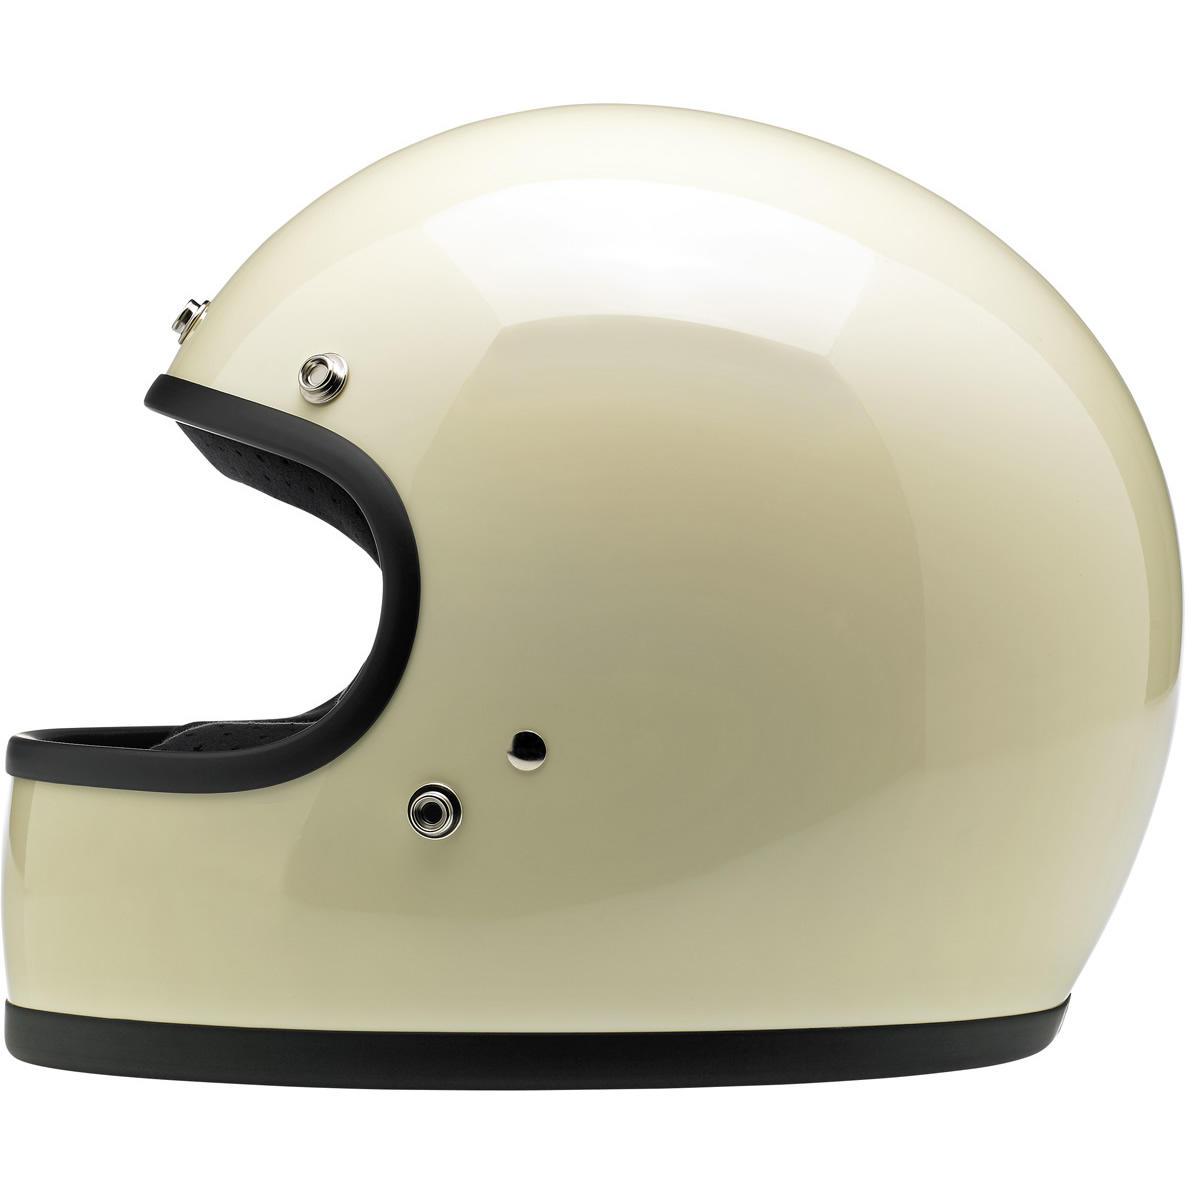 biltwell gringo helm ece gloss vintage white thunderbike. Black Bedroom Furniture Sets. Home Design Ideas